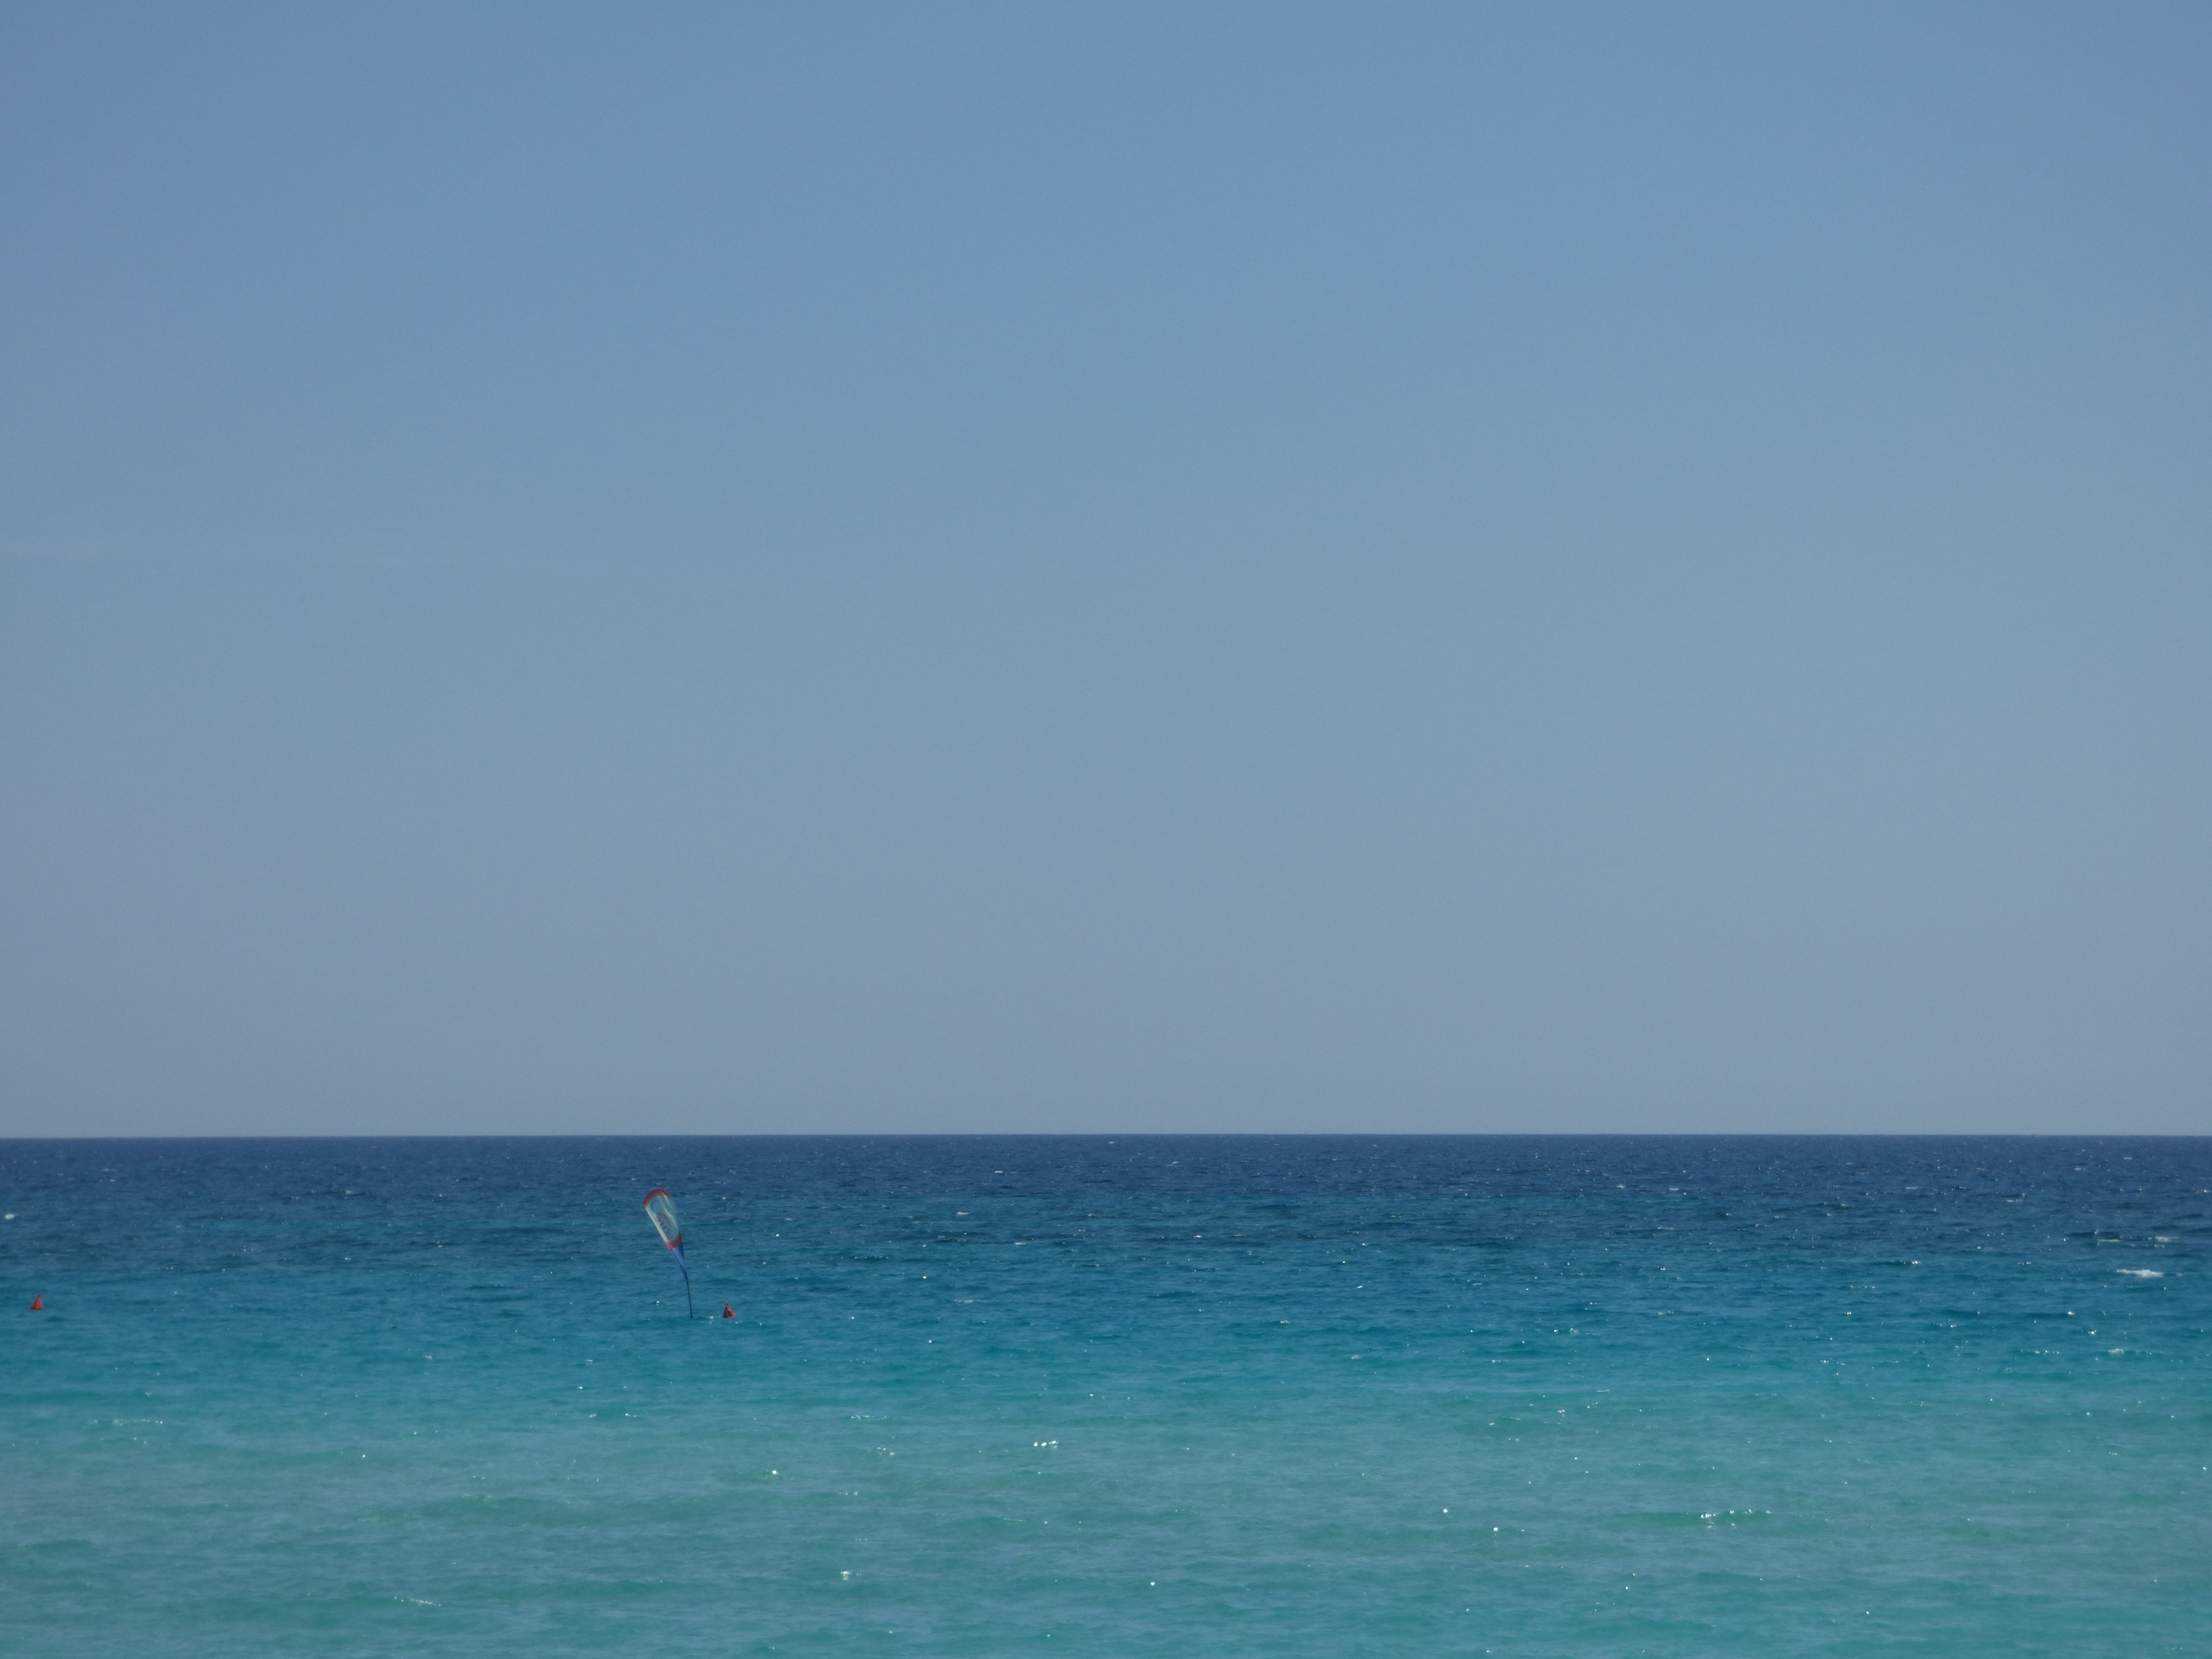 das-meer-bei-porto-cesareo-ii-il-mare-di-porto-cesareo-ii Unser Meer